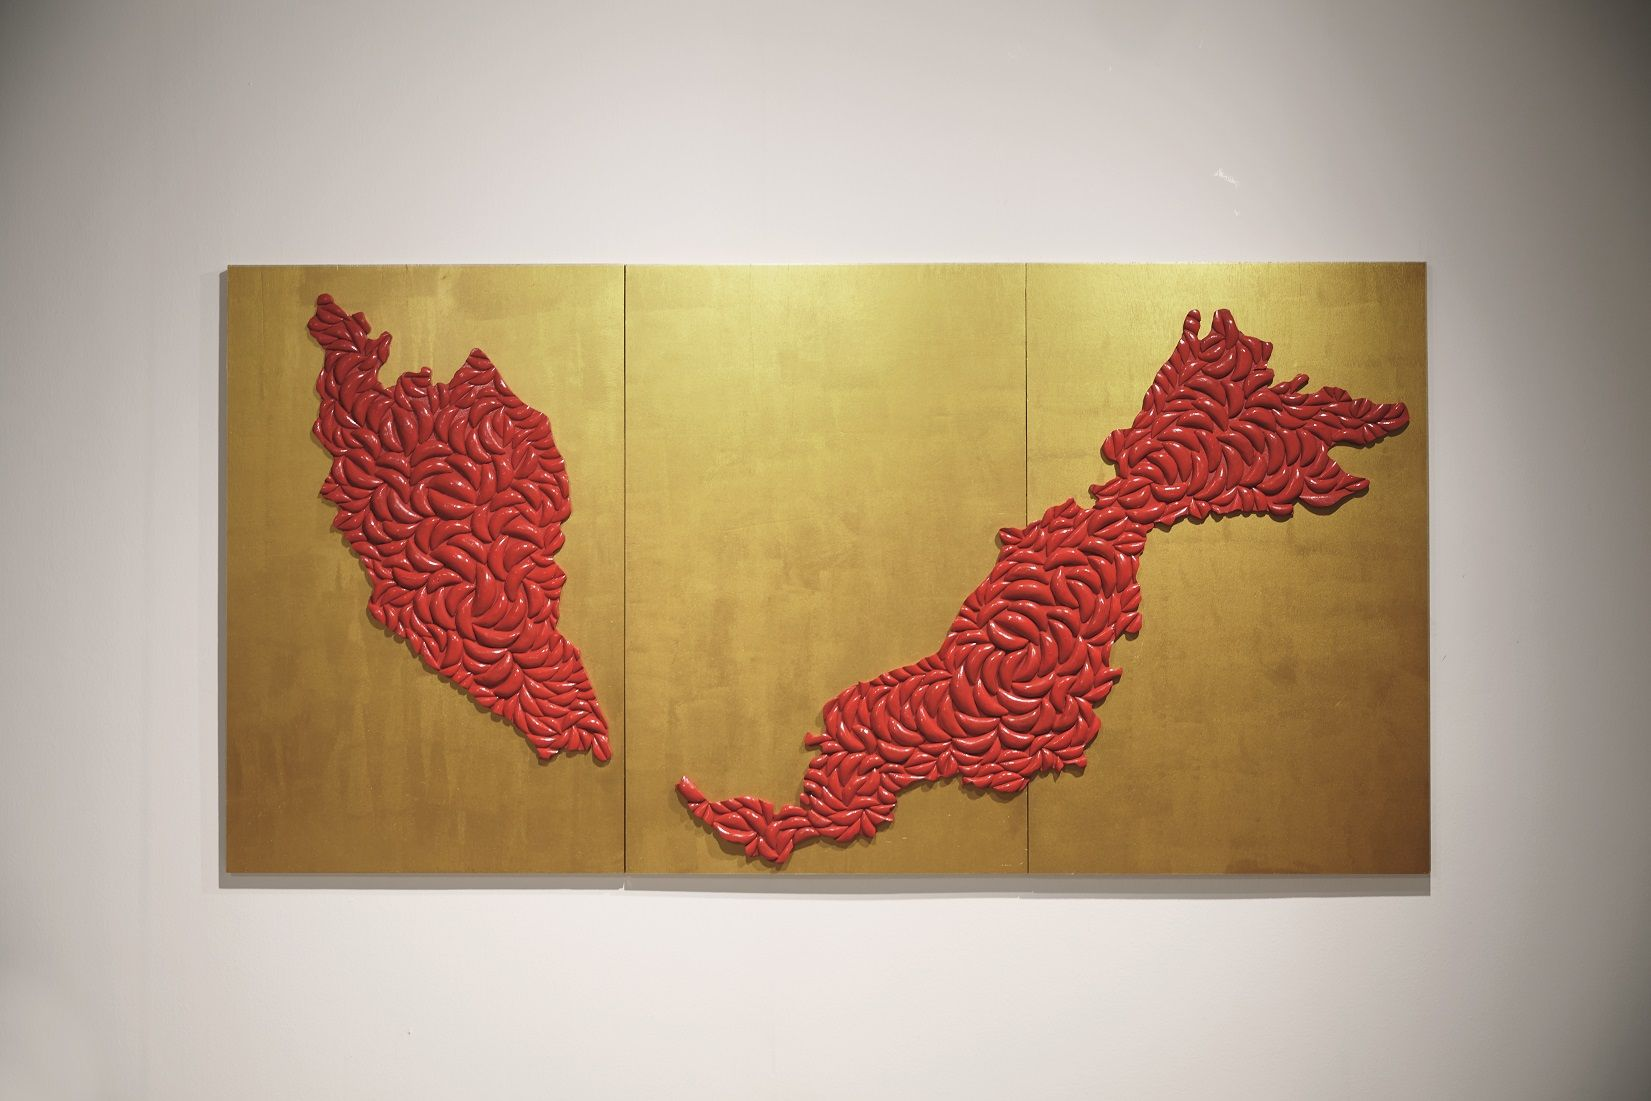 Malaysia Map, Lee Mok Yee, Chinese Praying Wood, Wood, House Paint, 324x144, 2013